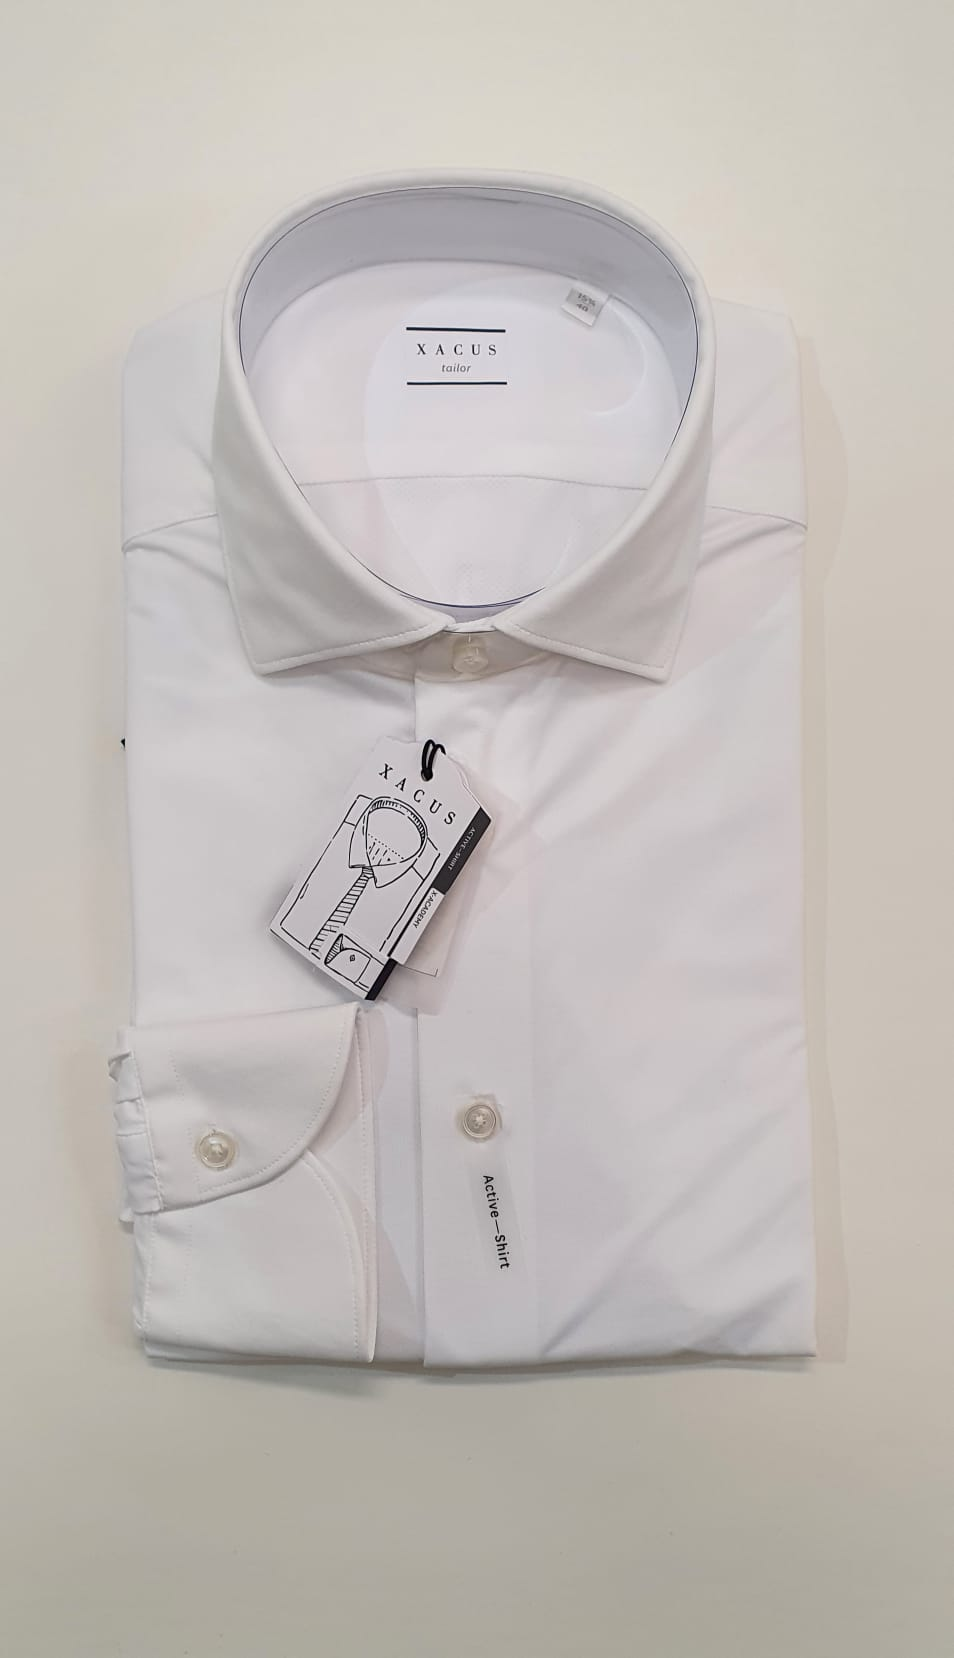 Camicia XACUS Active Tailor Poliammide Bianco